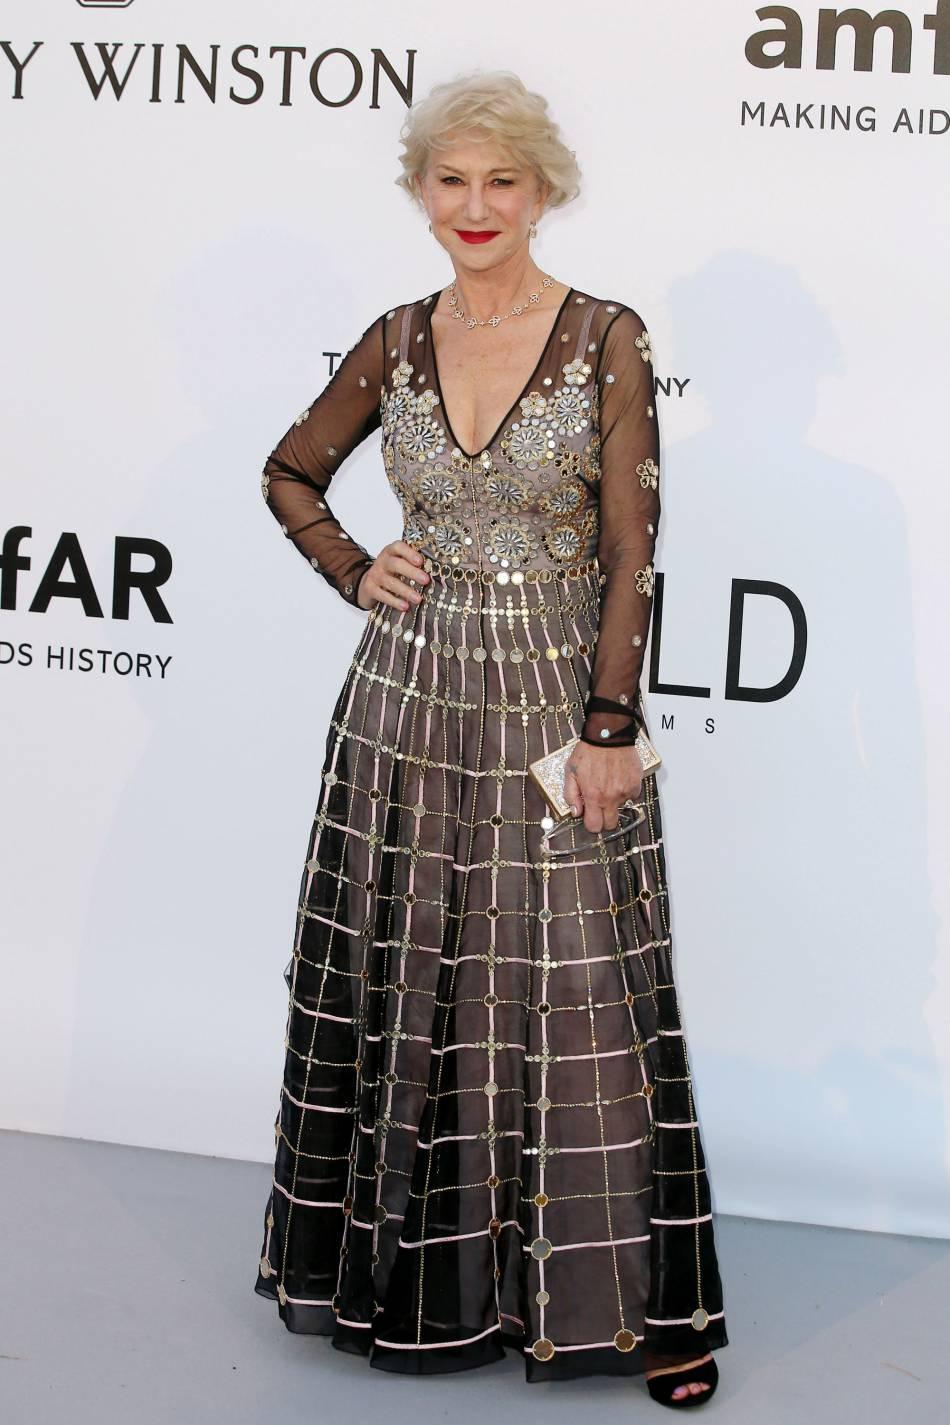 Helen Mirren en Temperley London, pochette Jimmy Choo et bijoux Harry Winston au gala de l'amfAR Cinema against AIDS le 19 mai 2016 à Cannes.